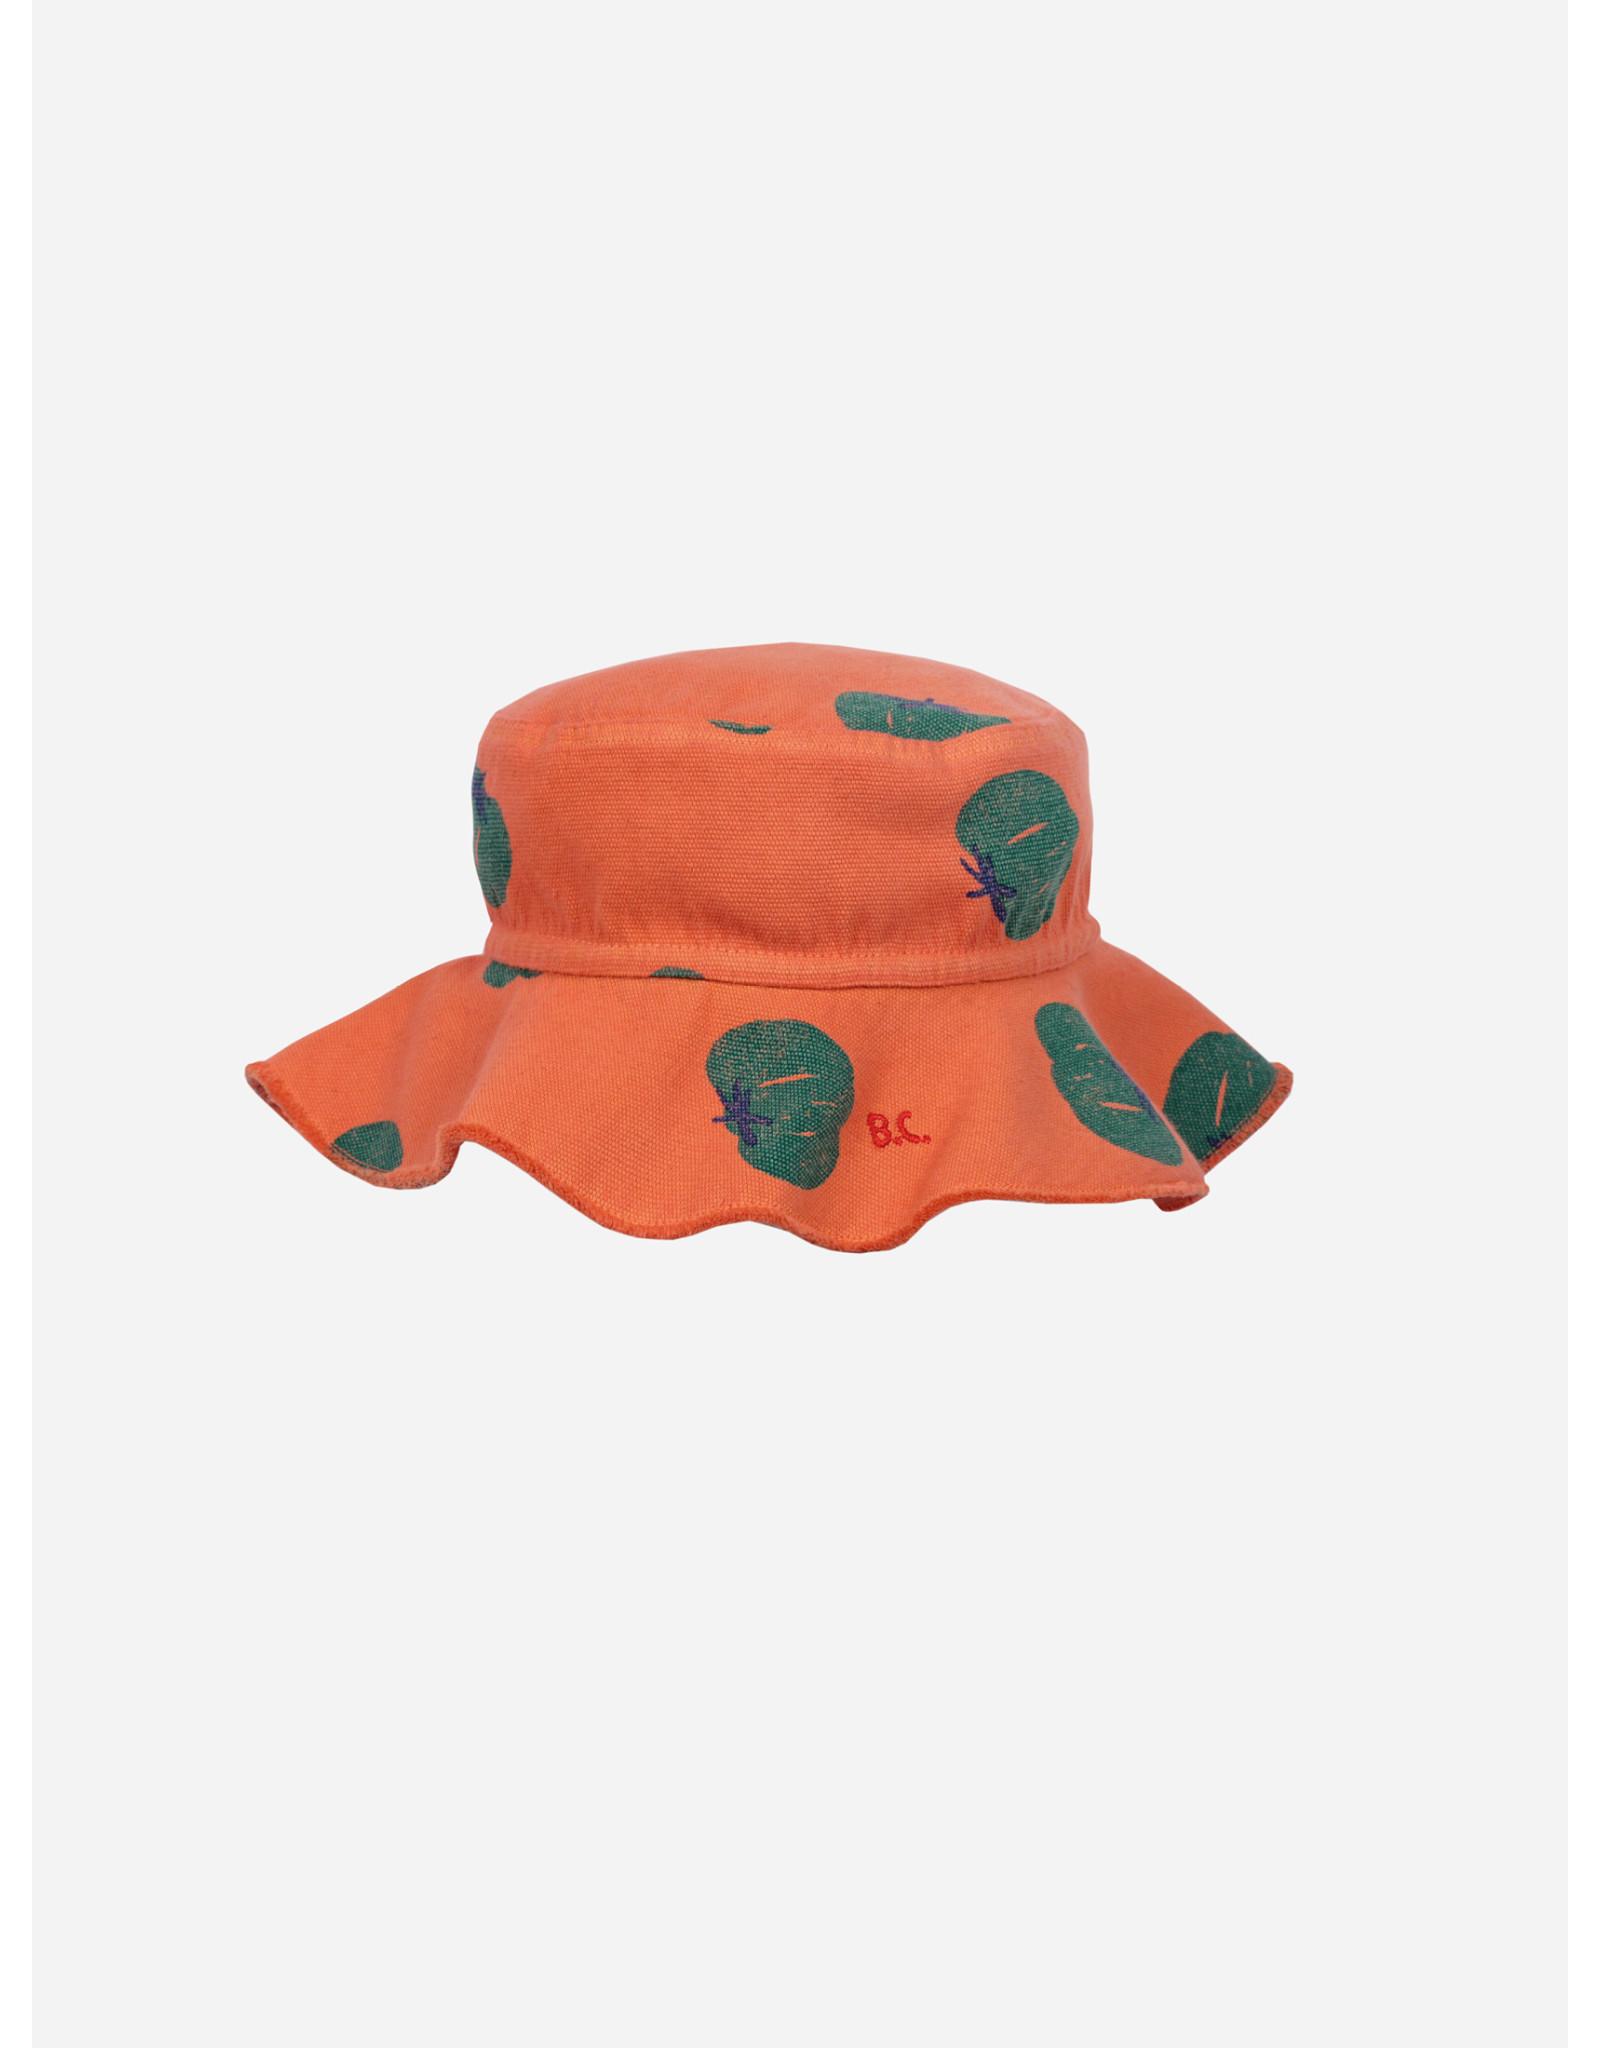 Bobo Choses Bobo Choses Tomatoes All Over Hat